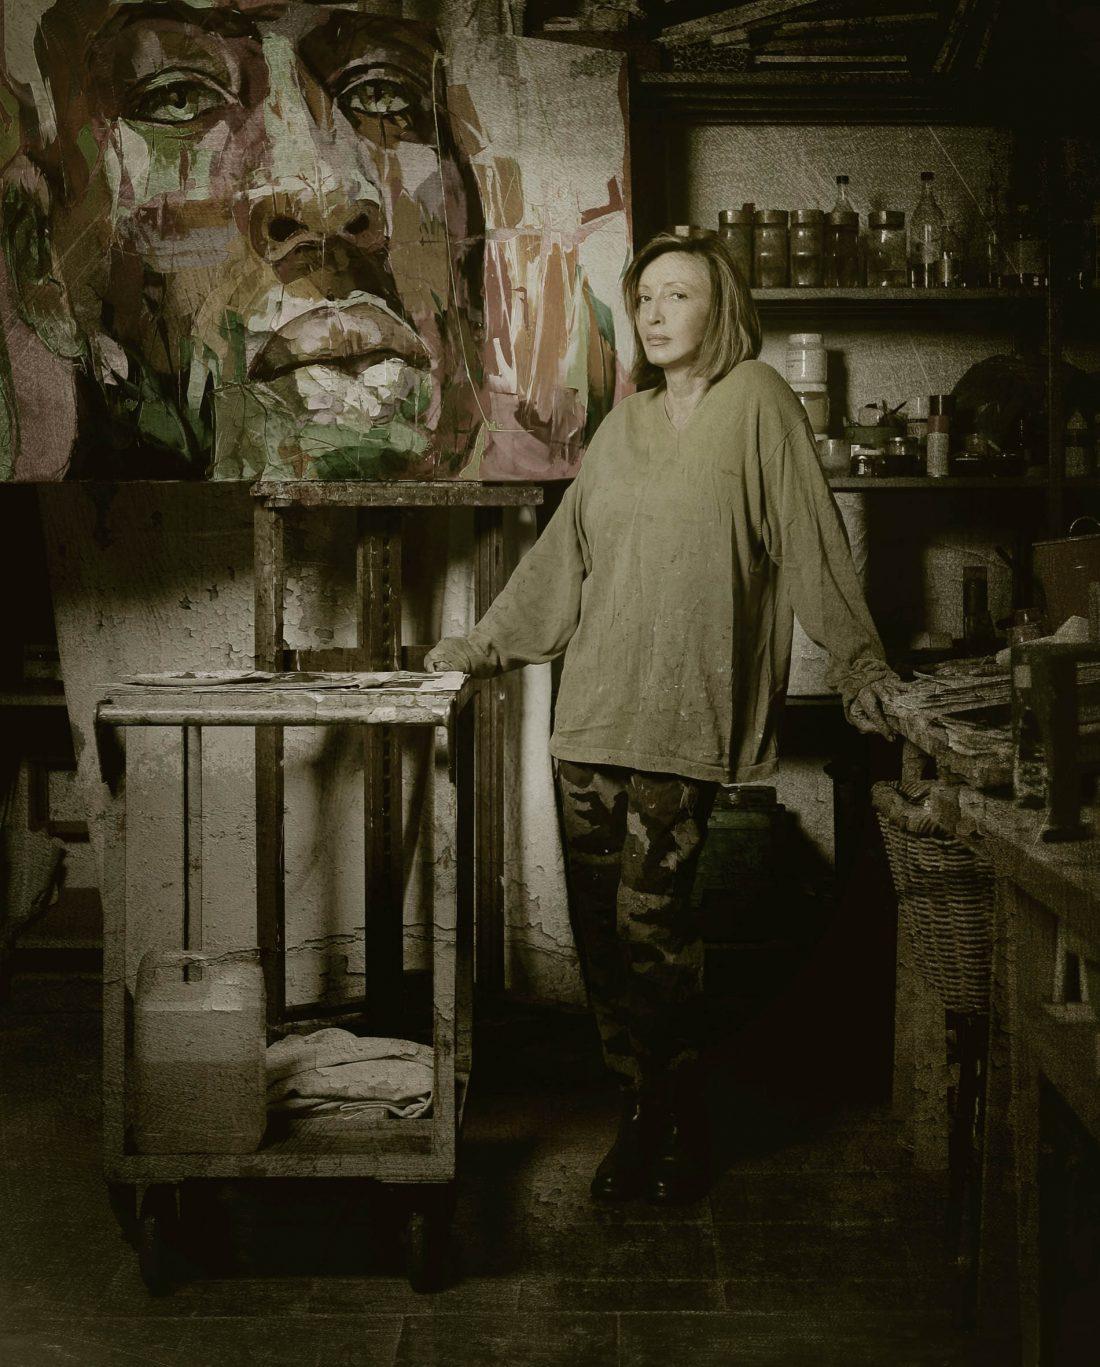 Francoise Nielly, portrait